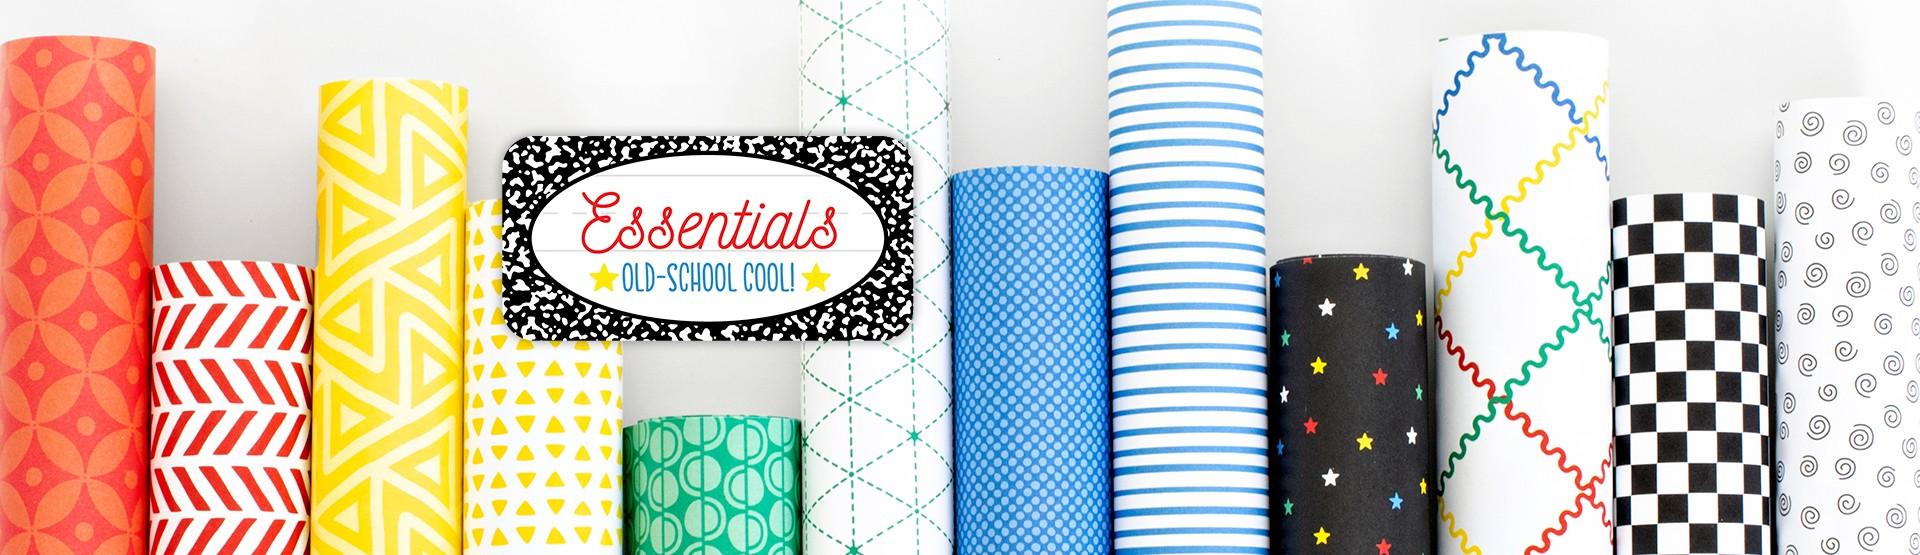 All Occasions & School: Essentials